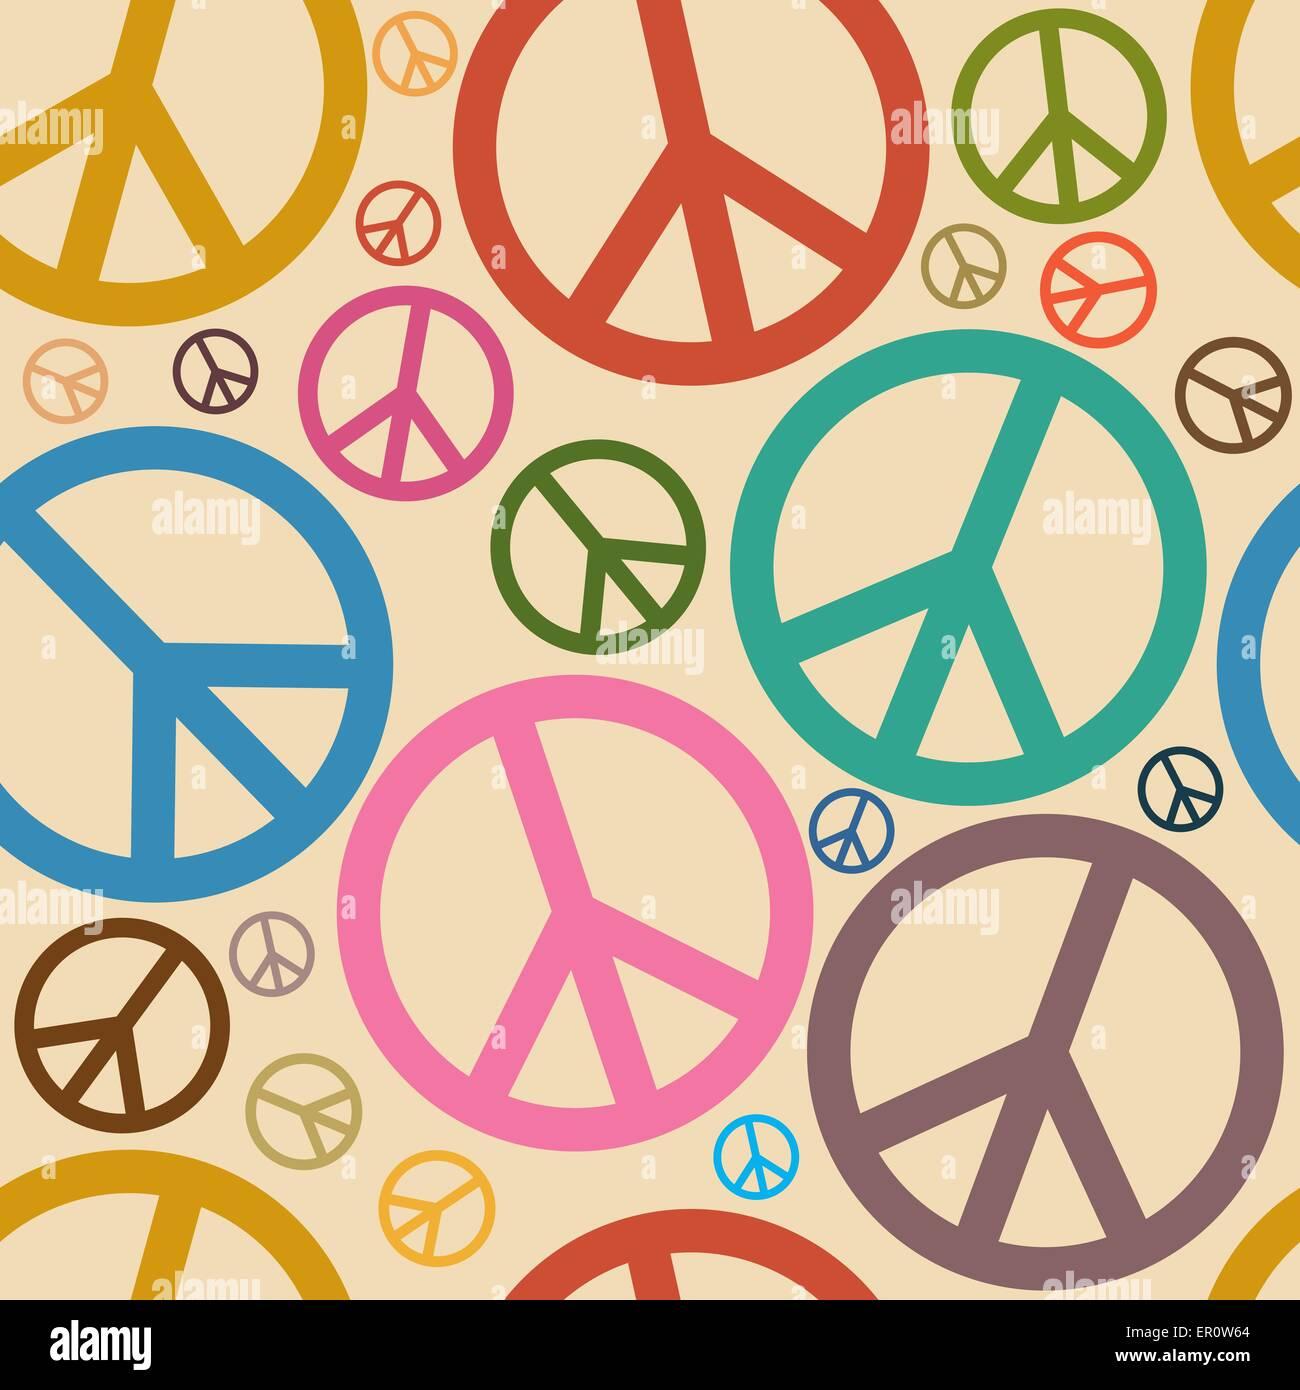 Seamless retro peace symbol background stock vector art seamless retro peace symbol background biocorpaavc Images